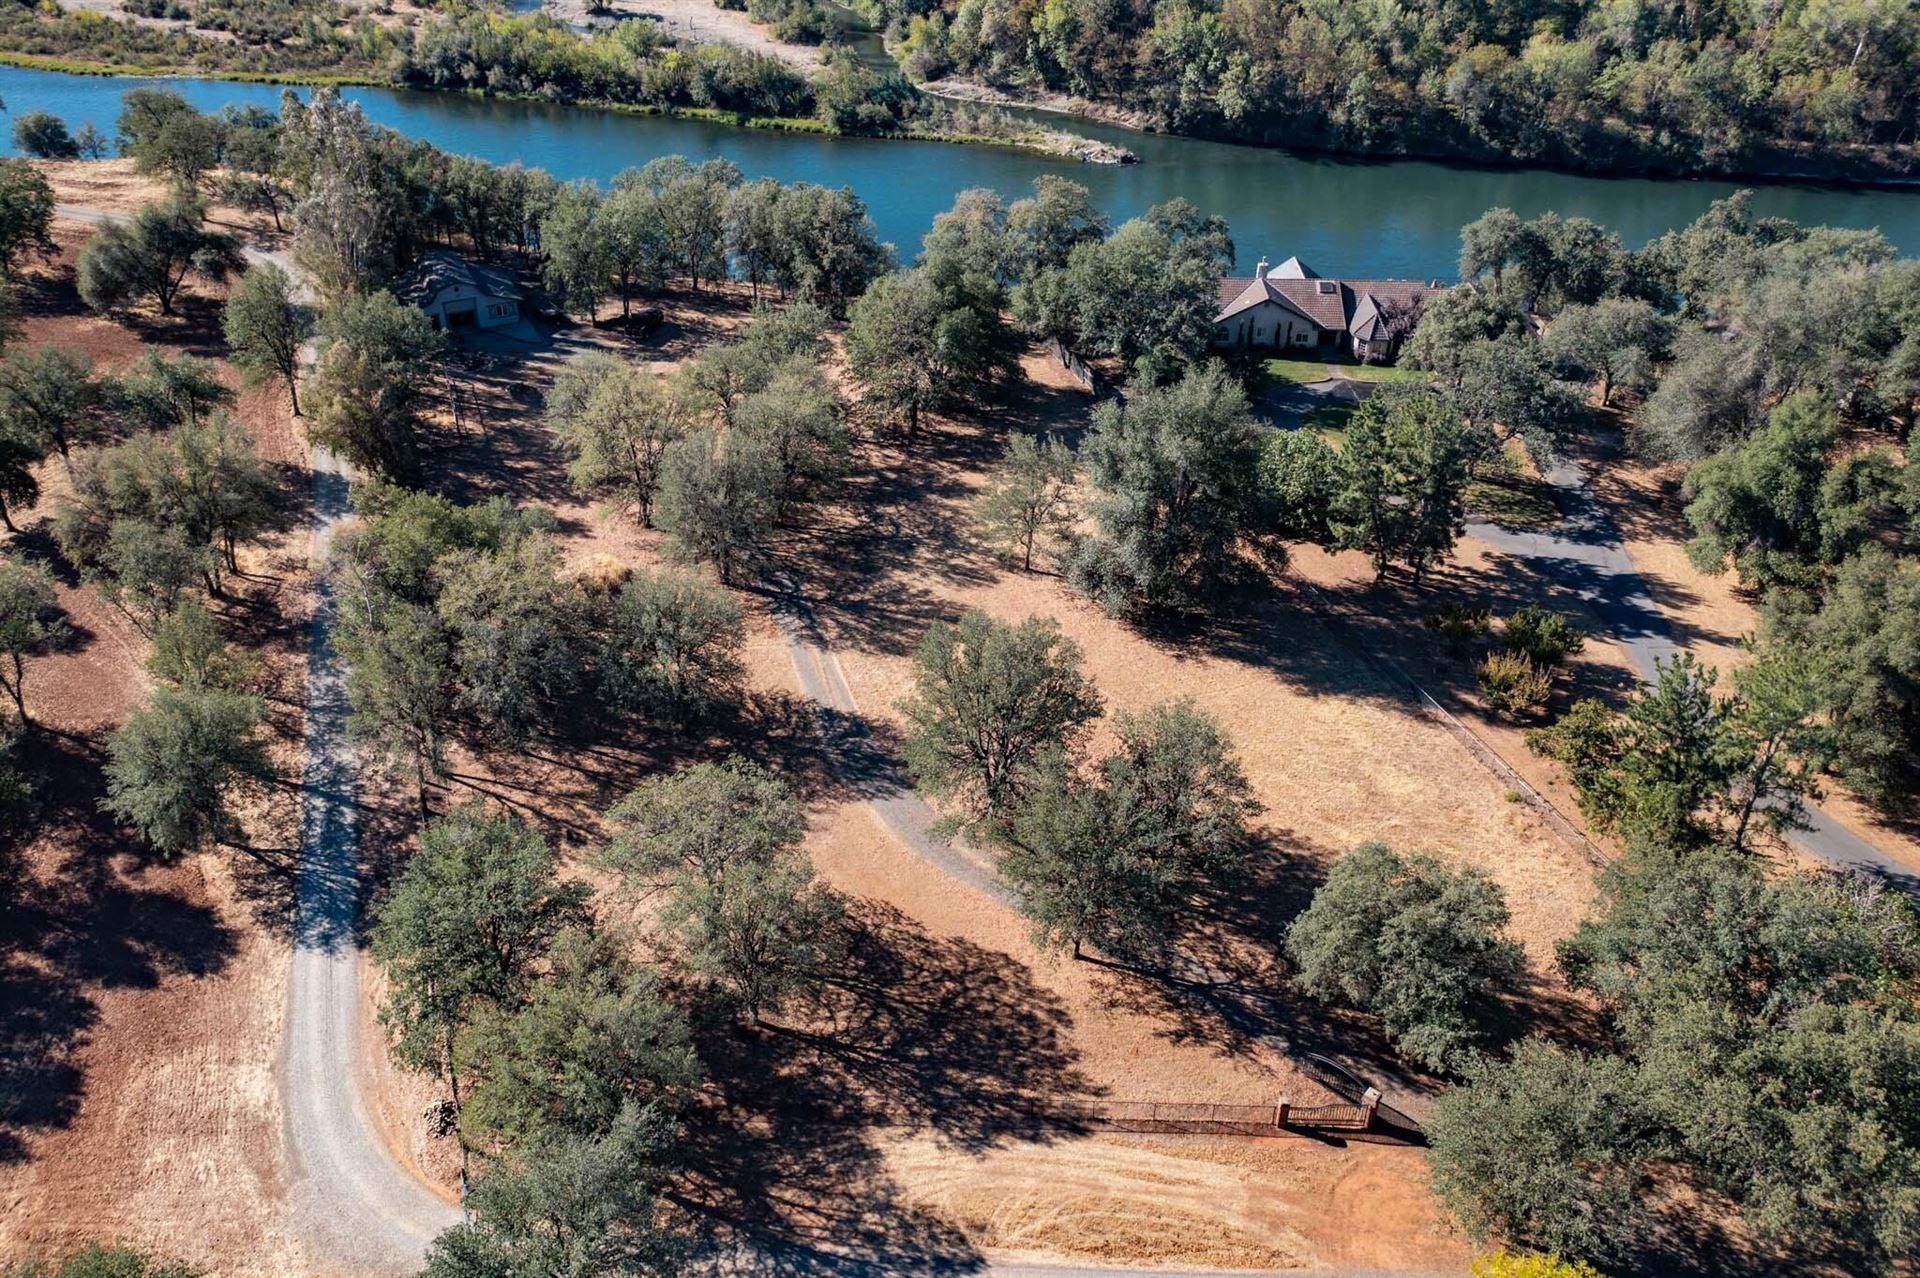 Photo of 6286 Park Ridge Dr, Anderson, CA 96007 (MLS # 21-4859)